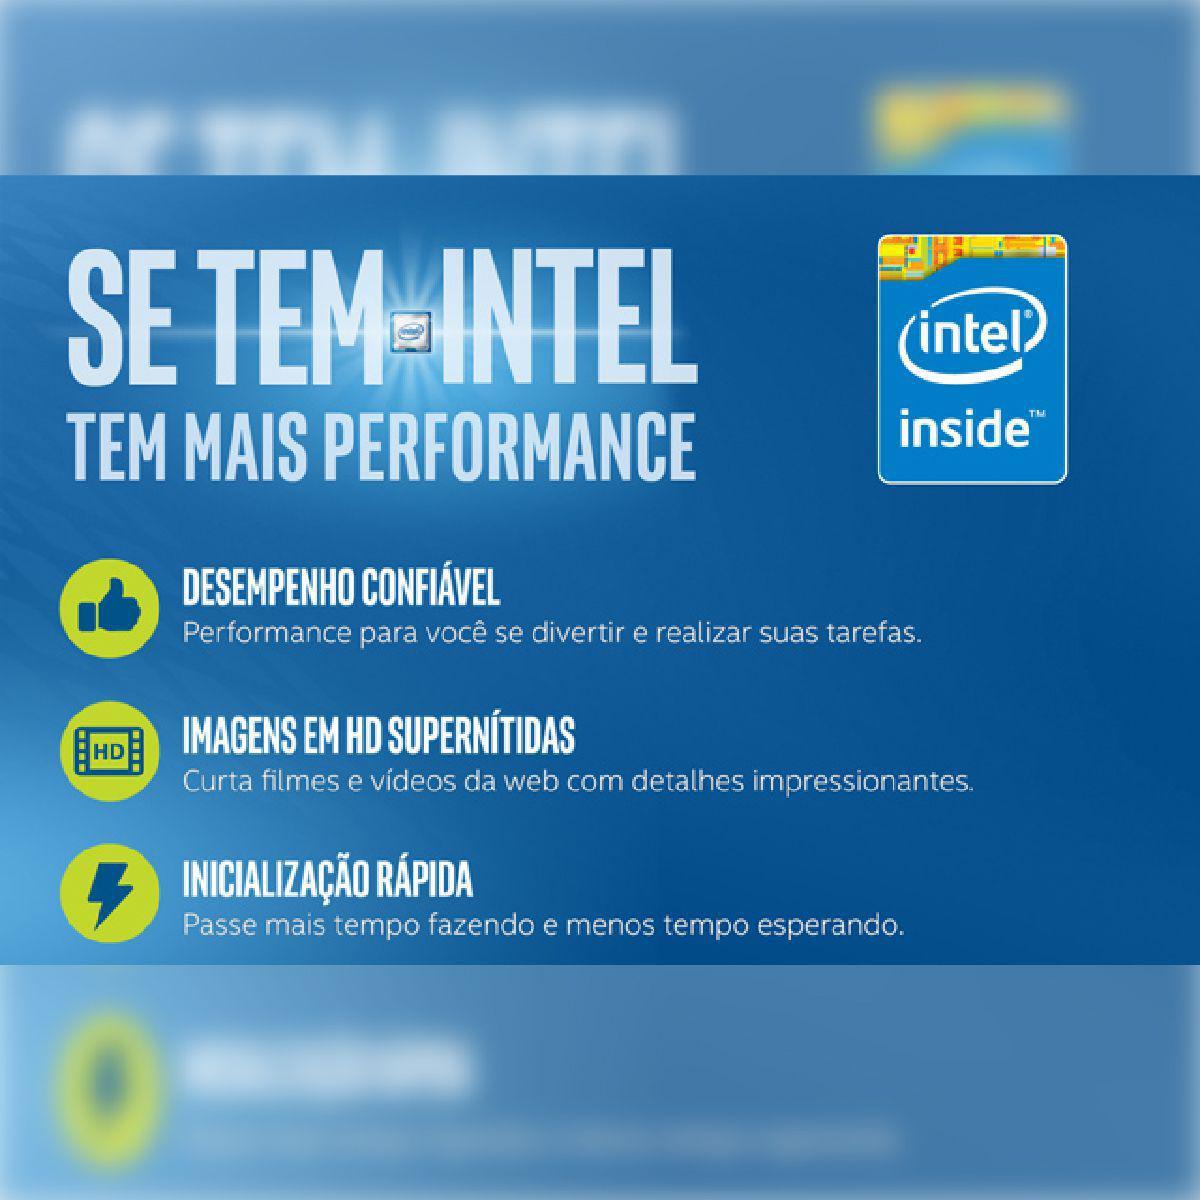 Pc Gamer Completo i5 16gb Hd 1tb Ssd 120gb Placa De Video